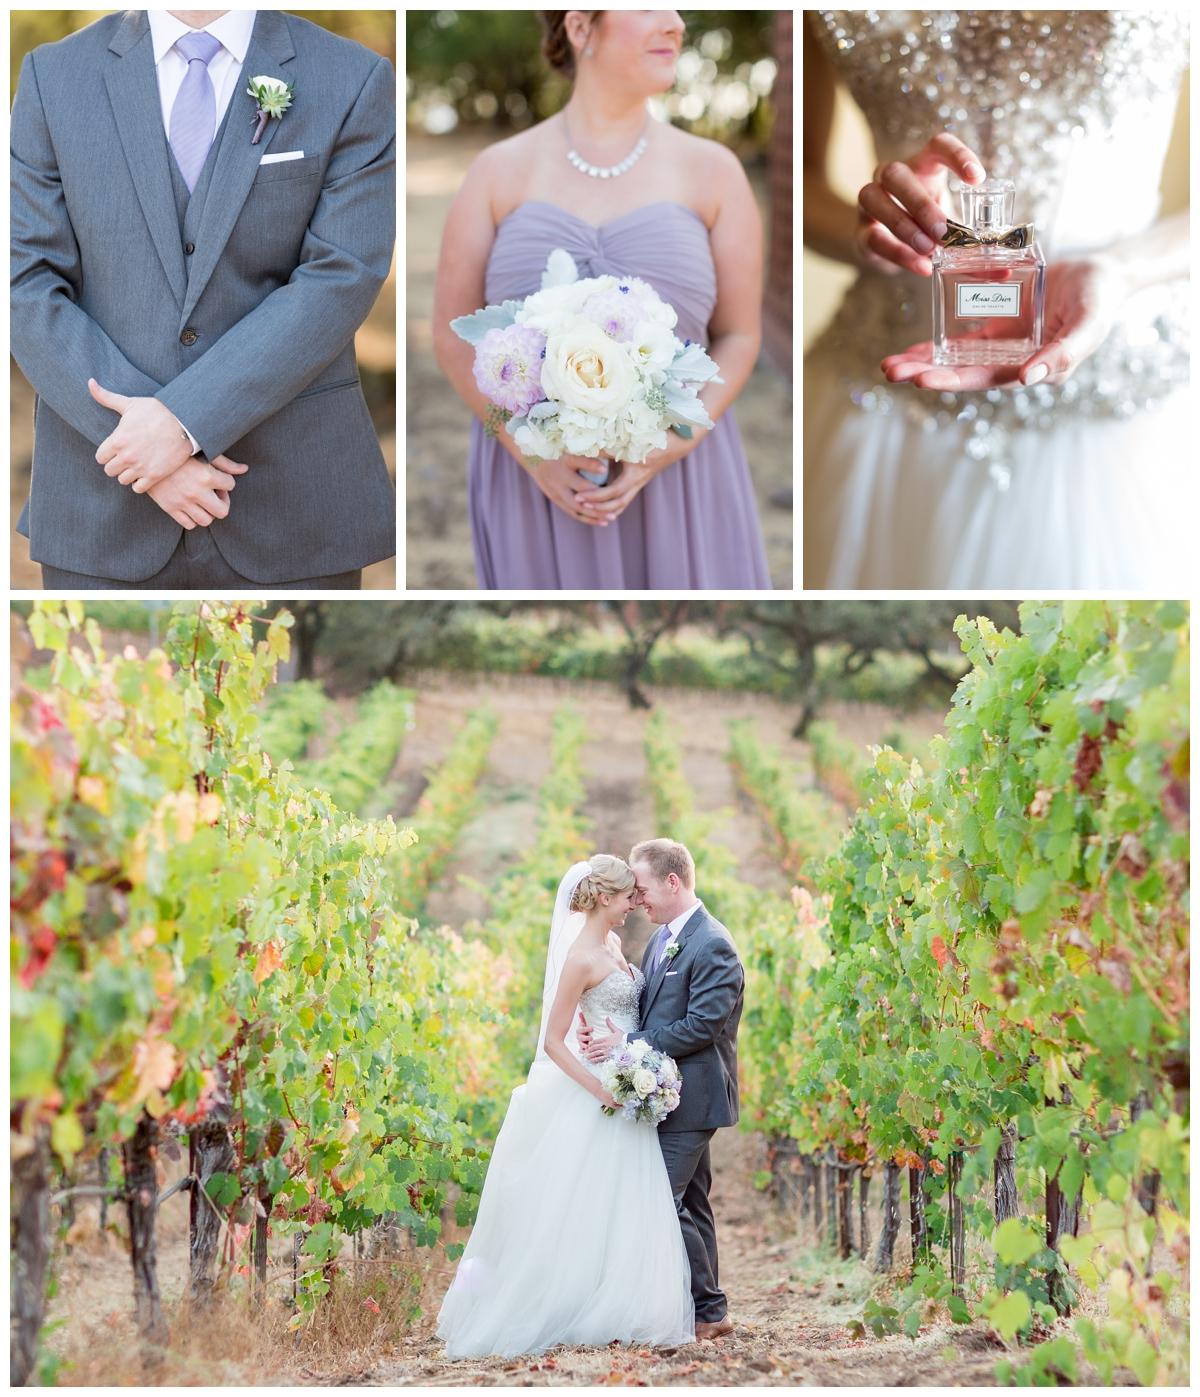 Paradise-Ridge-Winery-Wedding-Photography-DannyNicole_2183.jpg